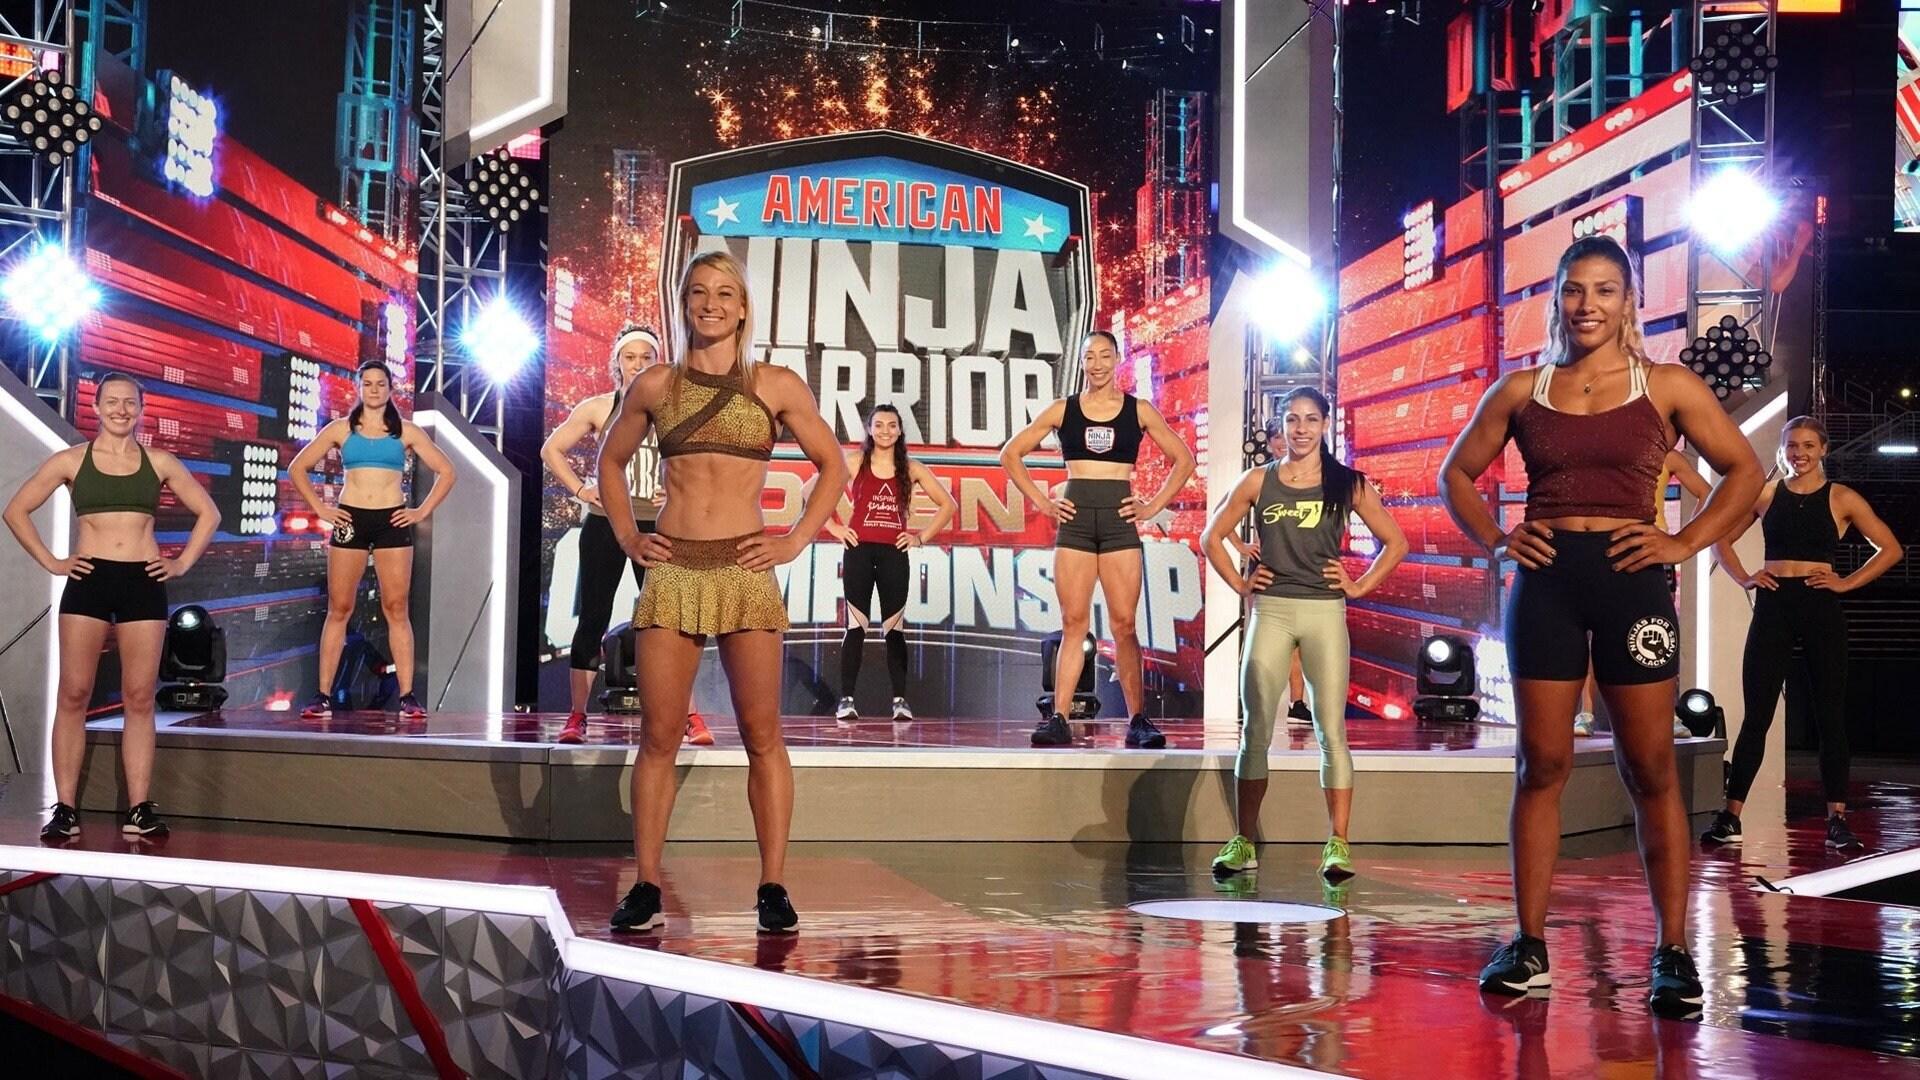 The American Ninja Warrior Women's Championship